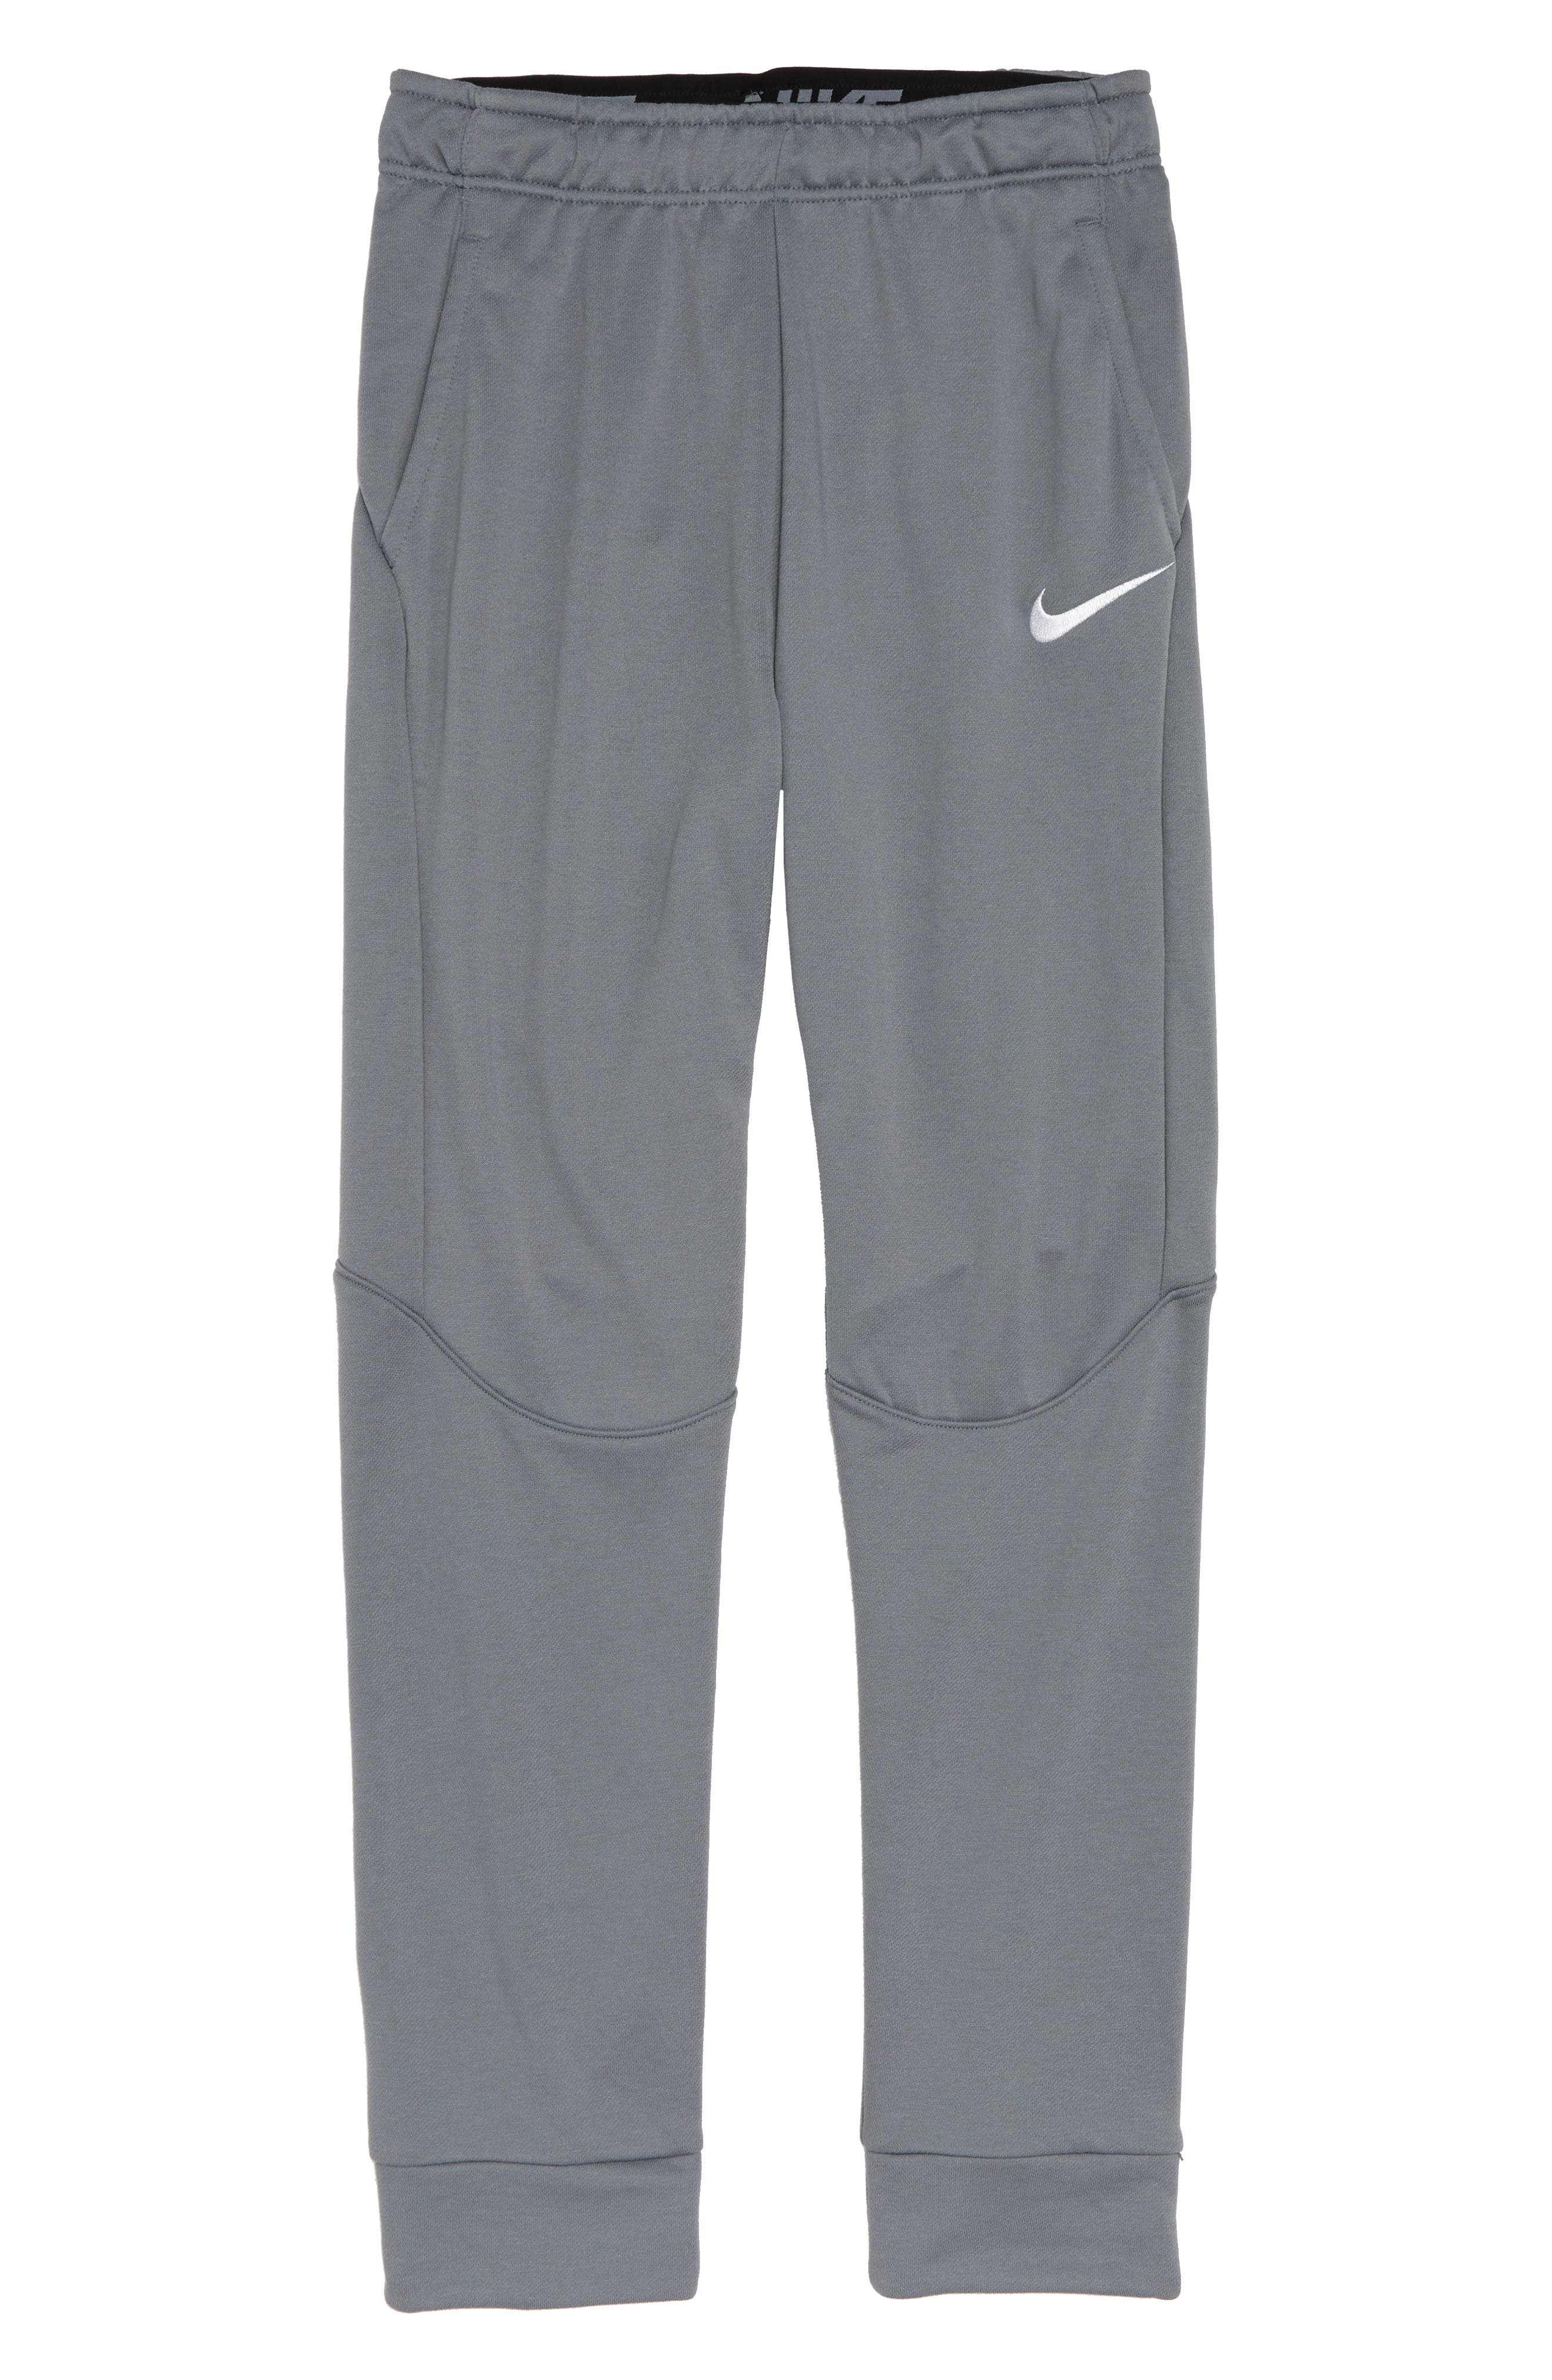 Dry Fleece Training Pants,                             Main thumbnail 1, color,                             COOL GREY/ WHITE